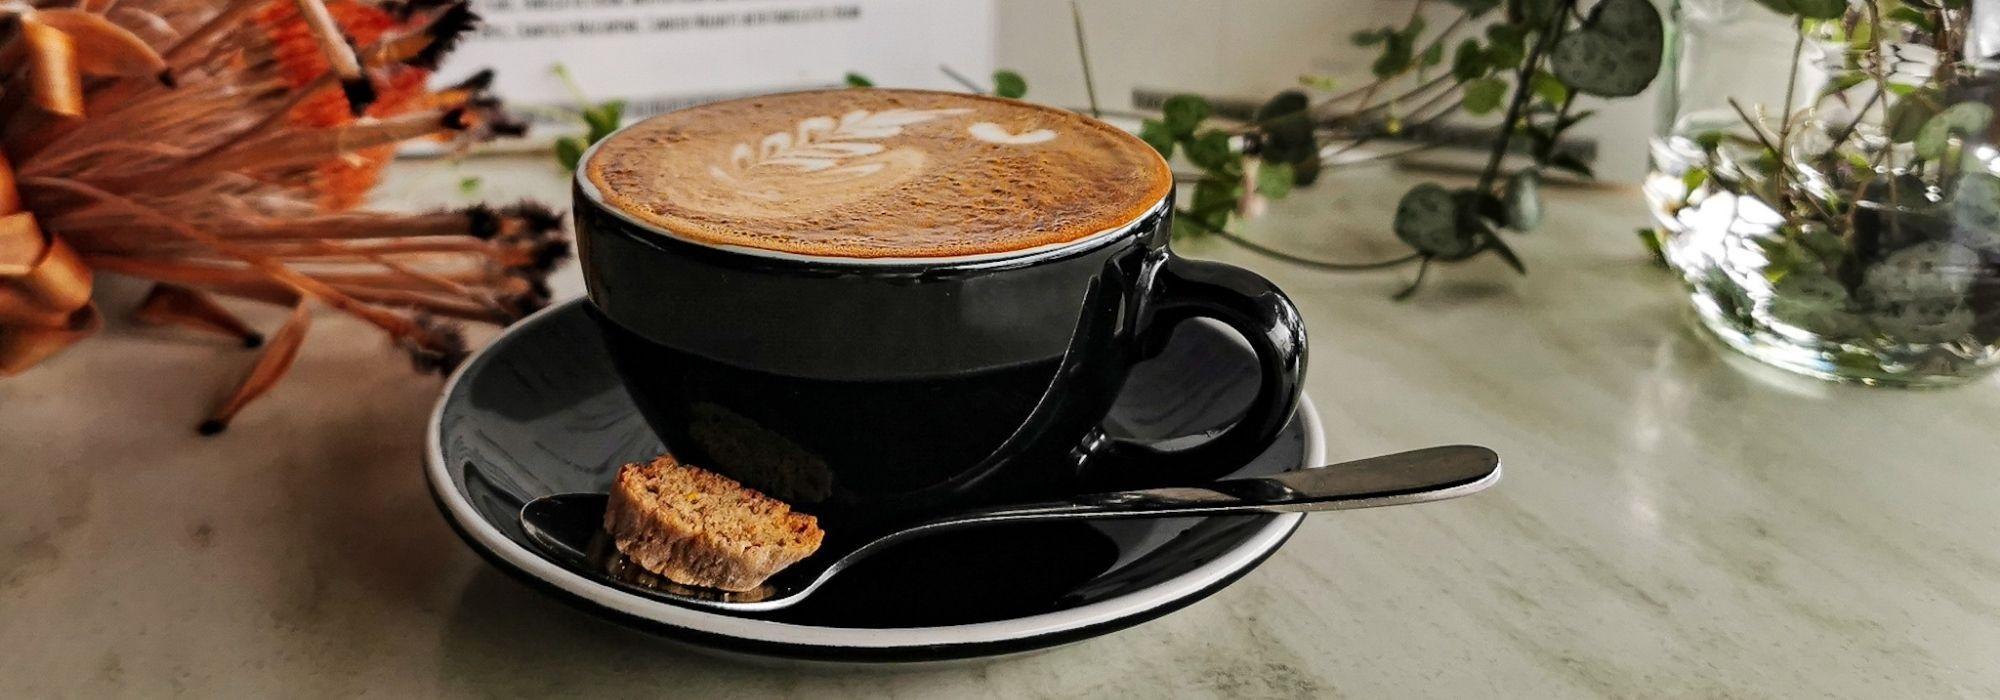 Catch up over a coffee in Rotorua